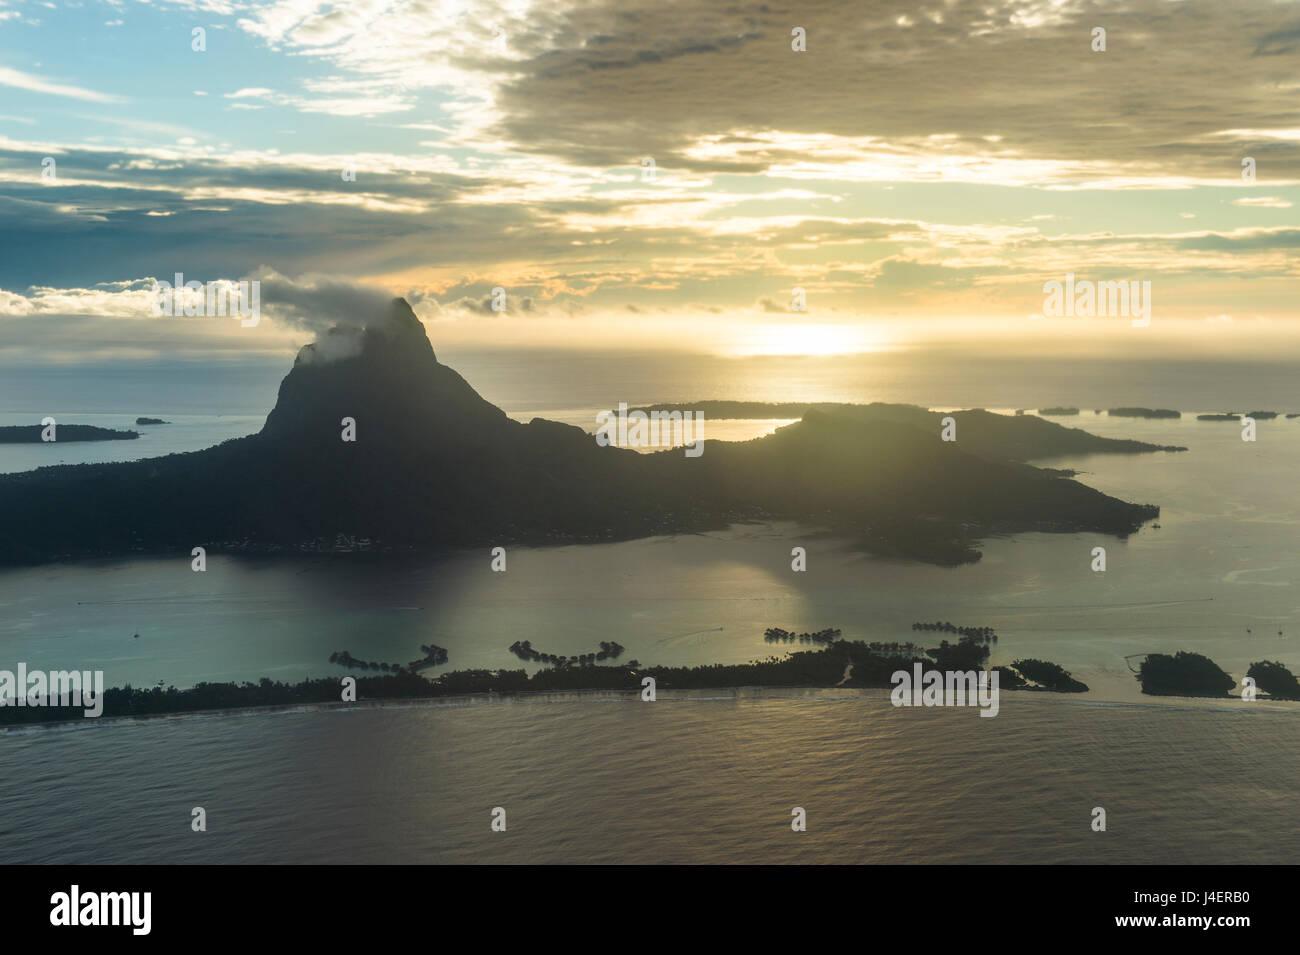 Aerial of Bora Bora, Society Islands, French Polynesia, Pacific - Stock Image